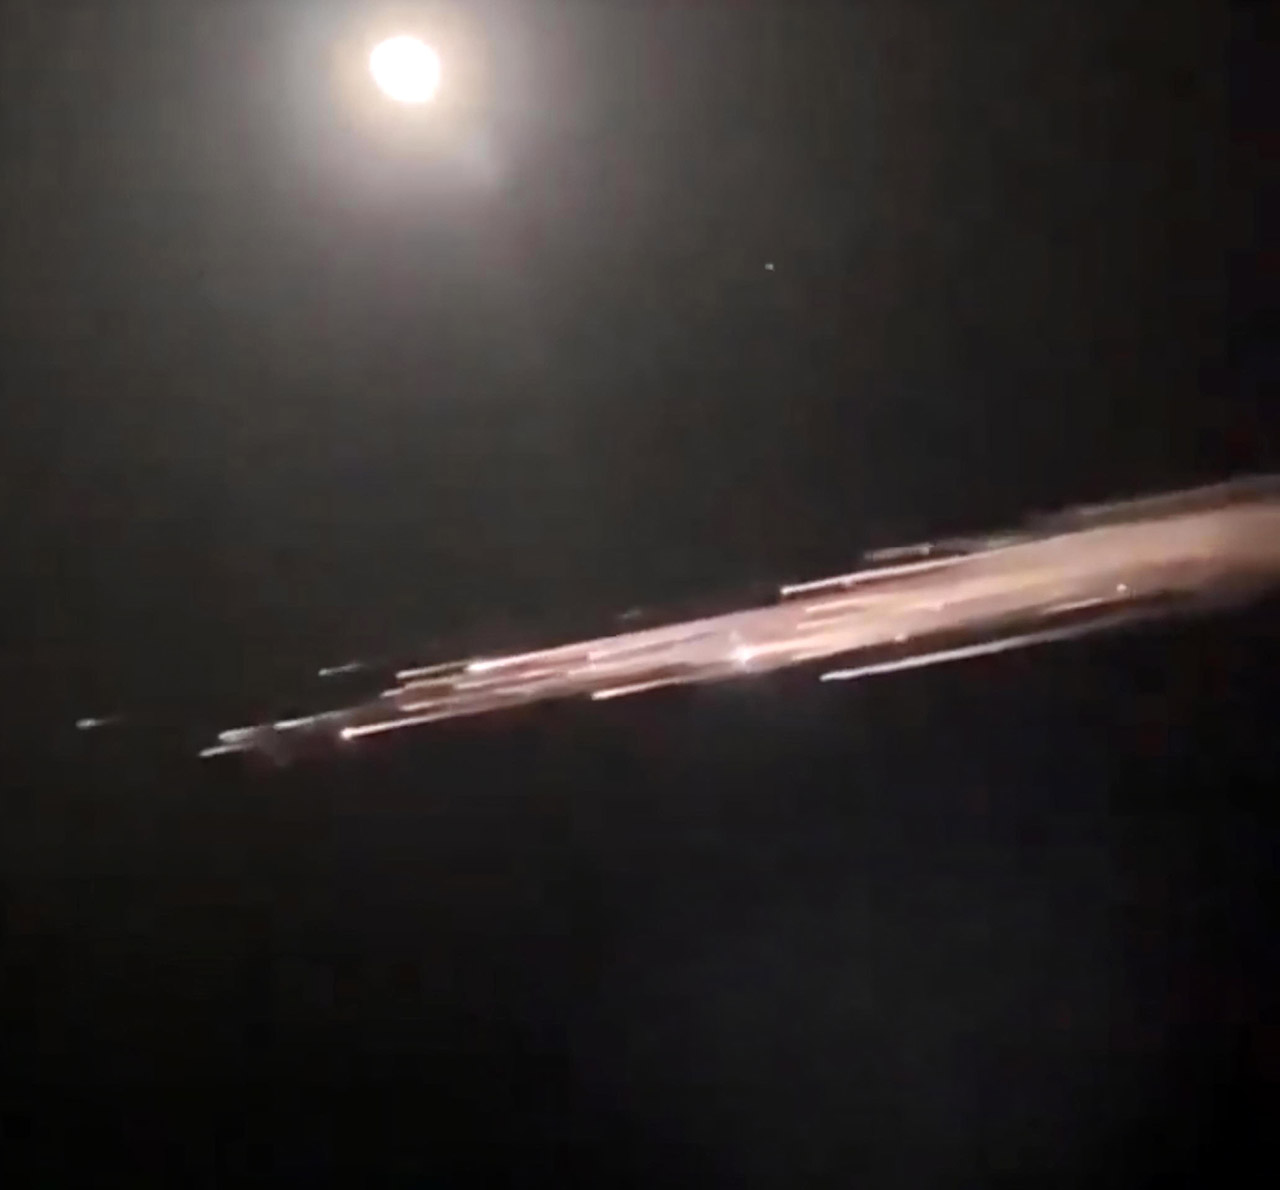 SpaceX Falcon 9 Rocket Debris Pacific Northwest